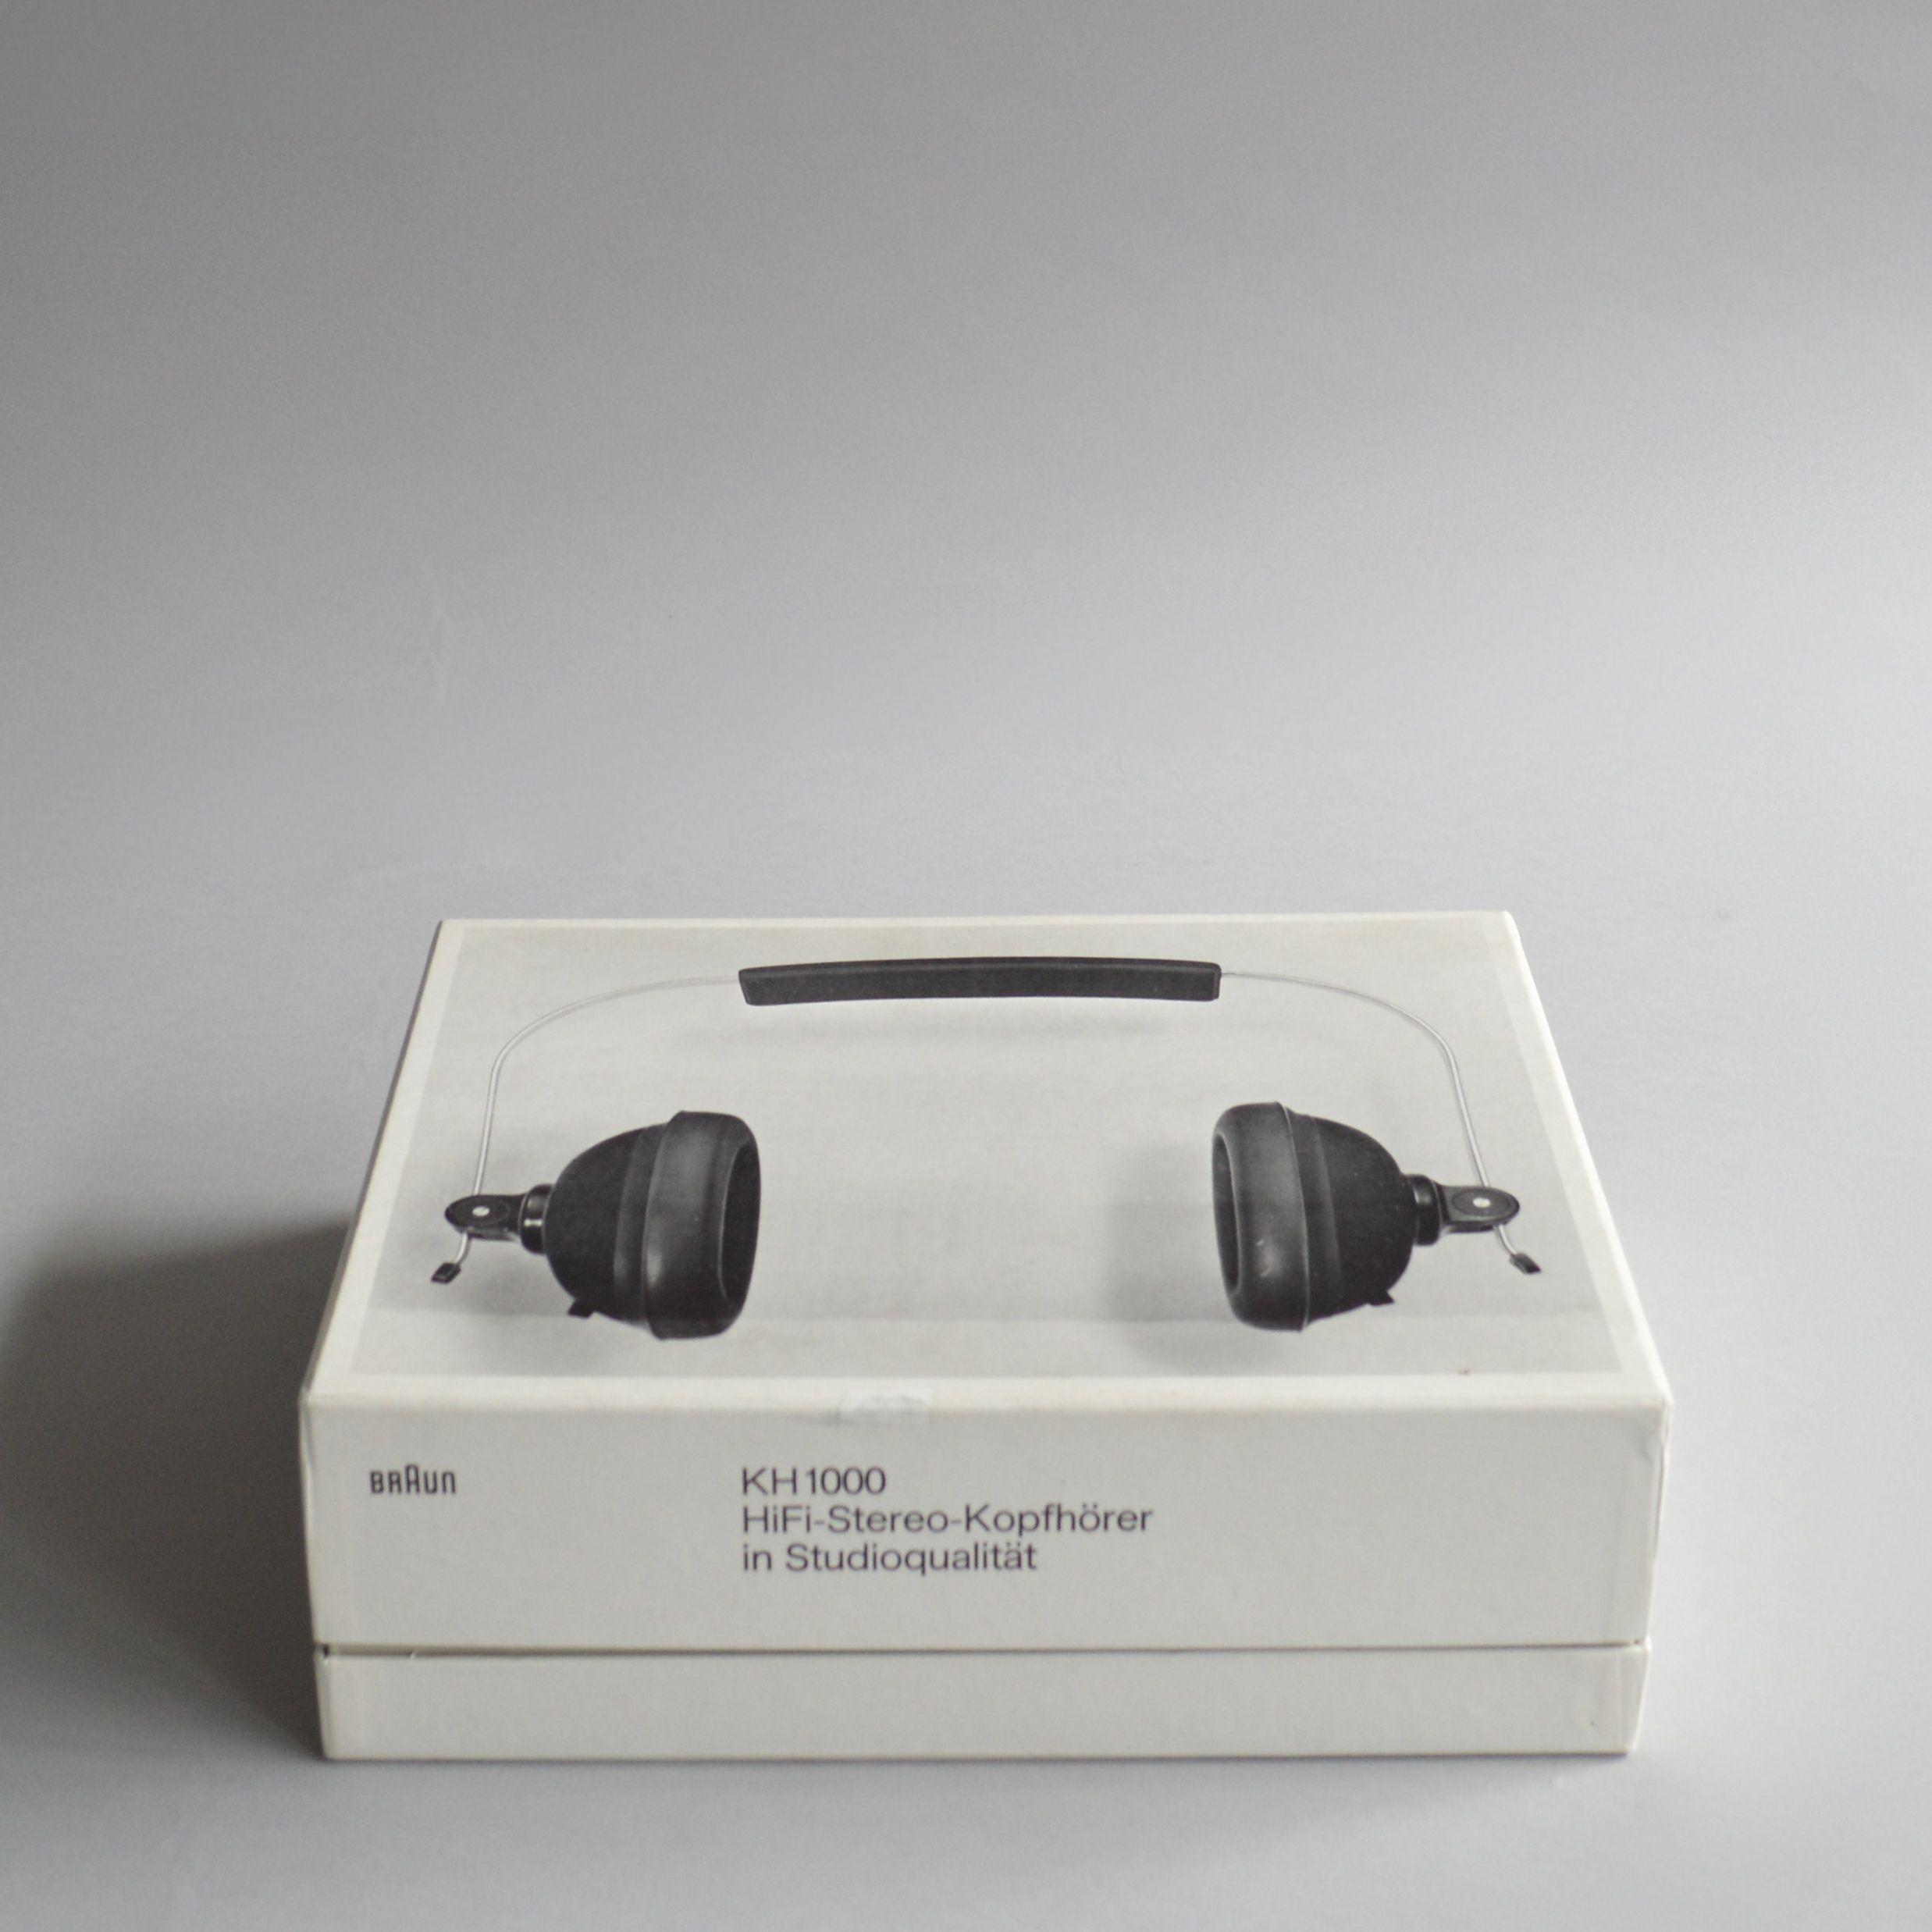 Braun KH 1000 | Packaging | Audio design, Packaging design ...